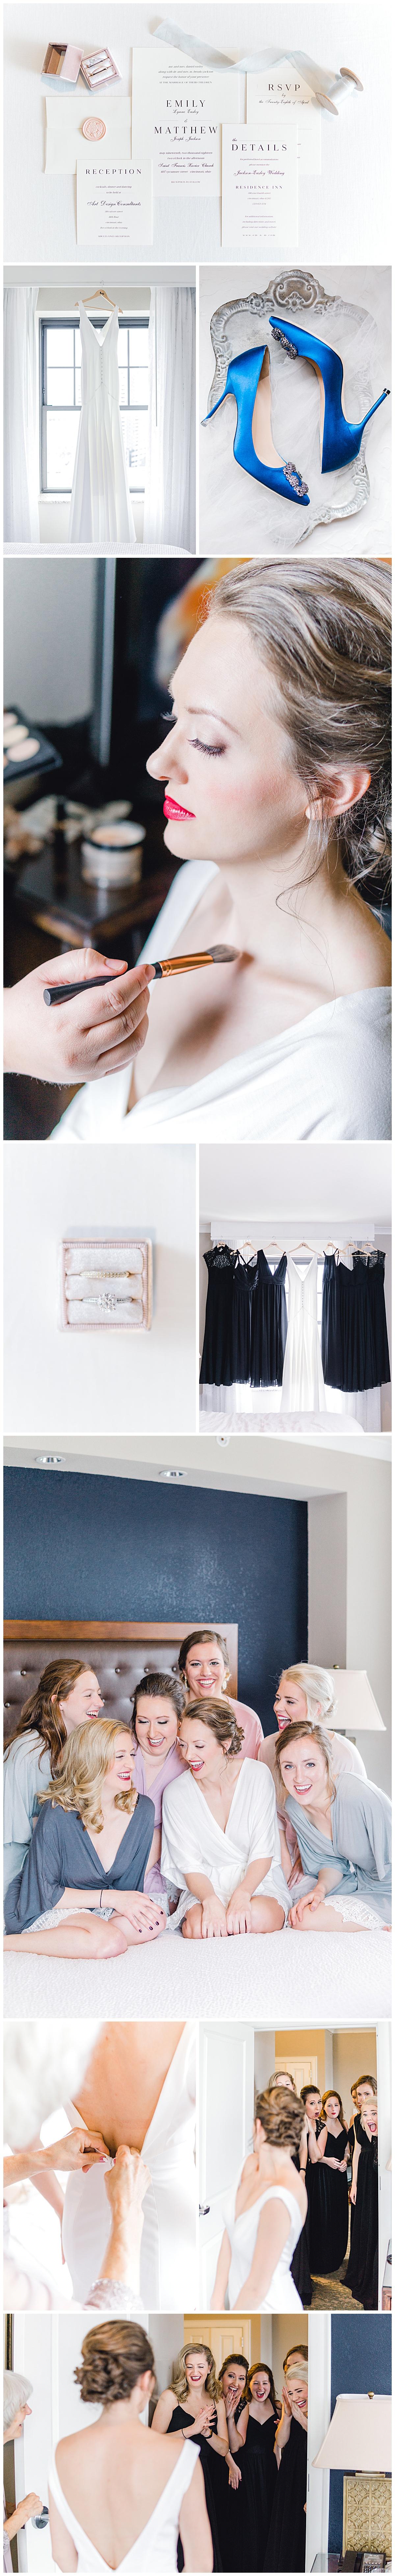 emily and matt's wedding cincinnati ohio chapel lane photography